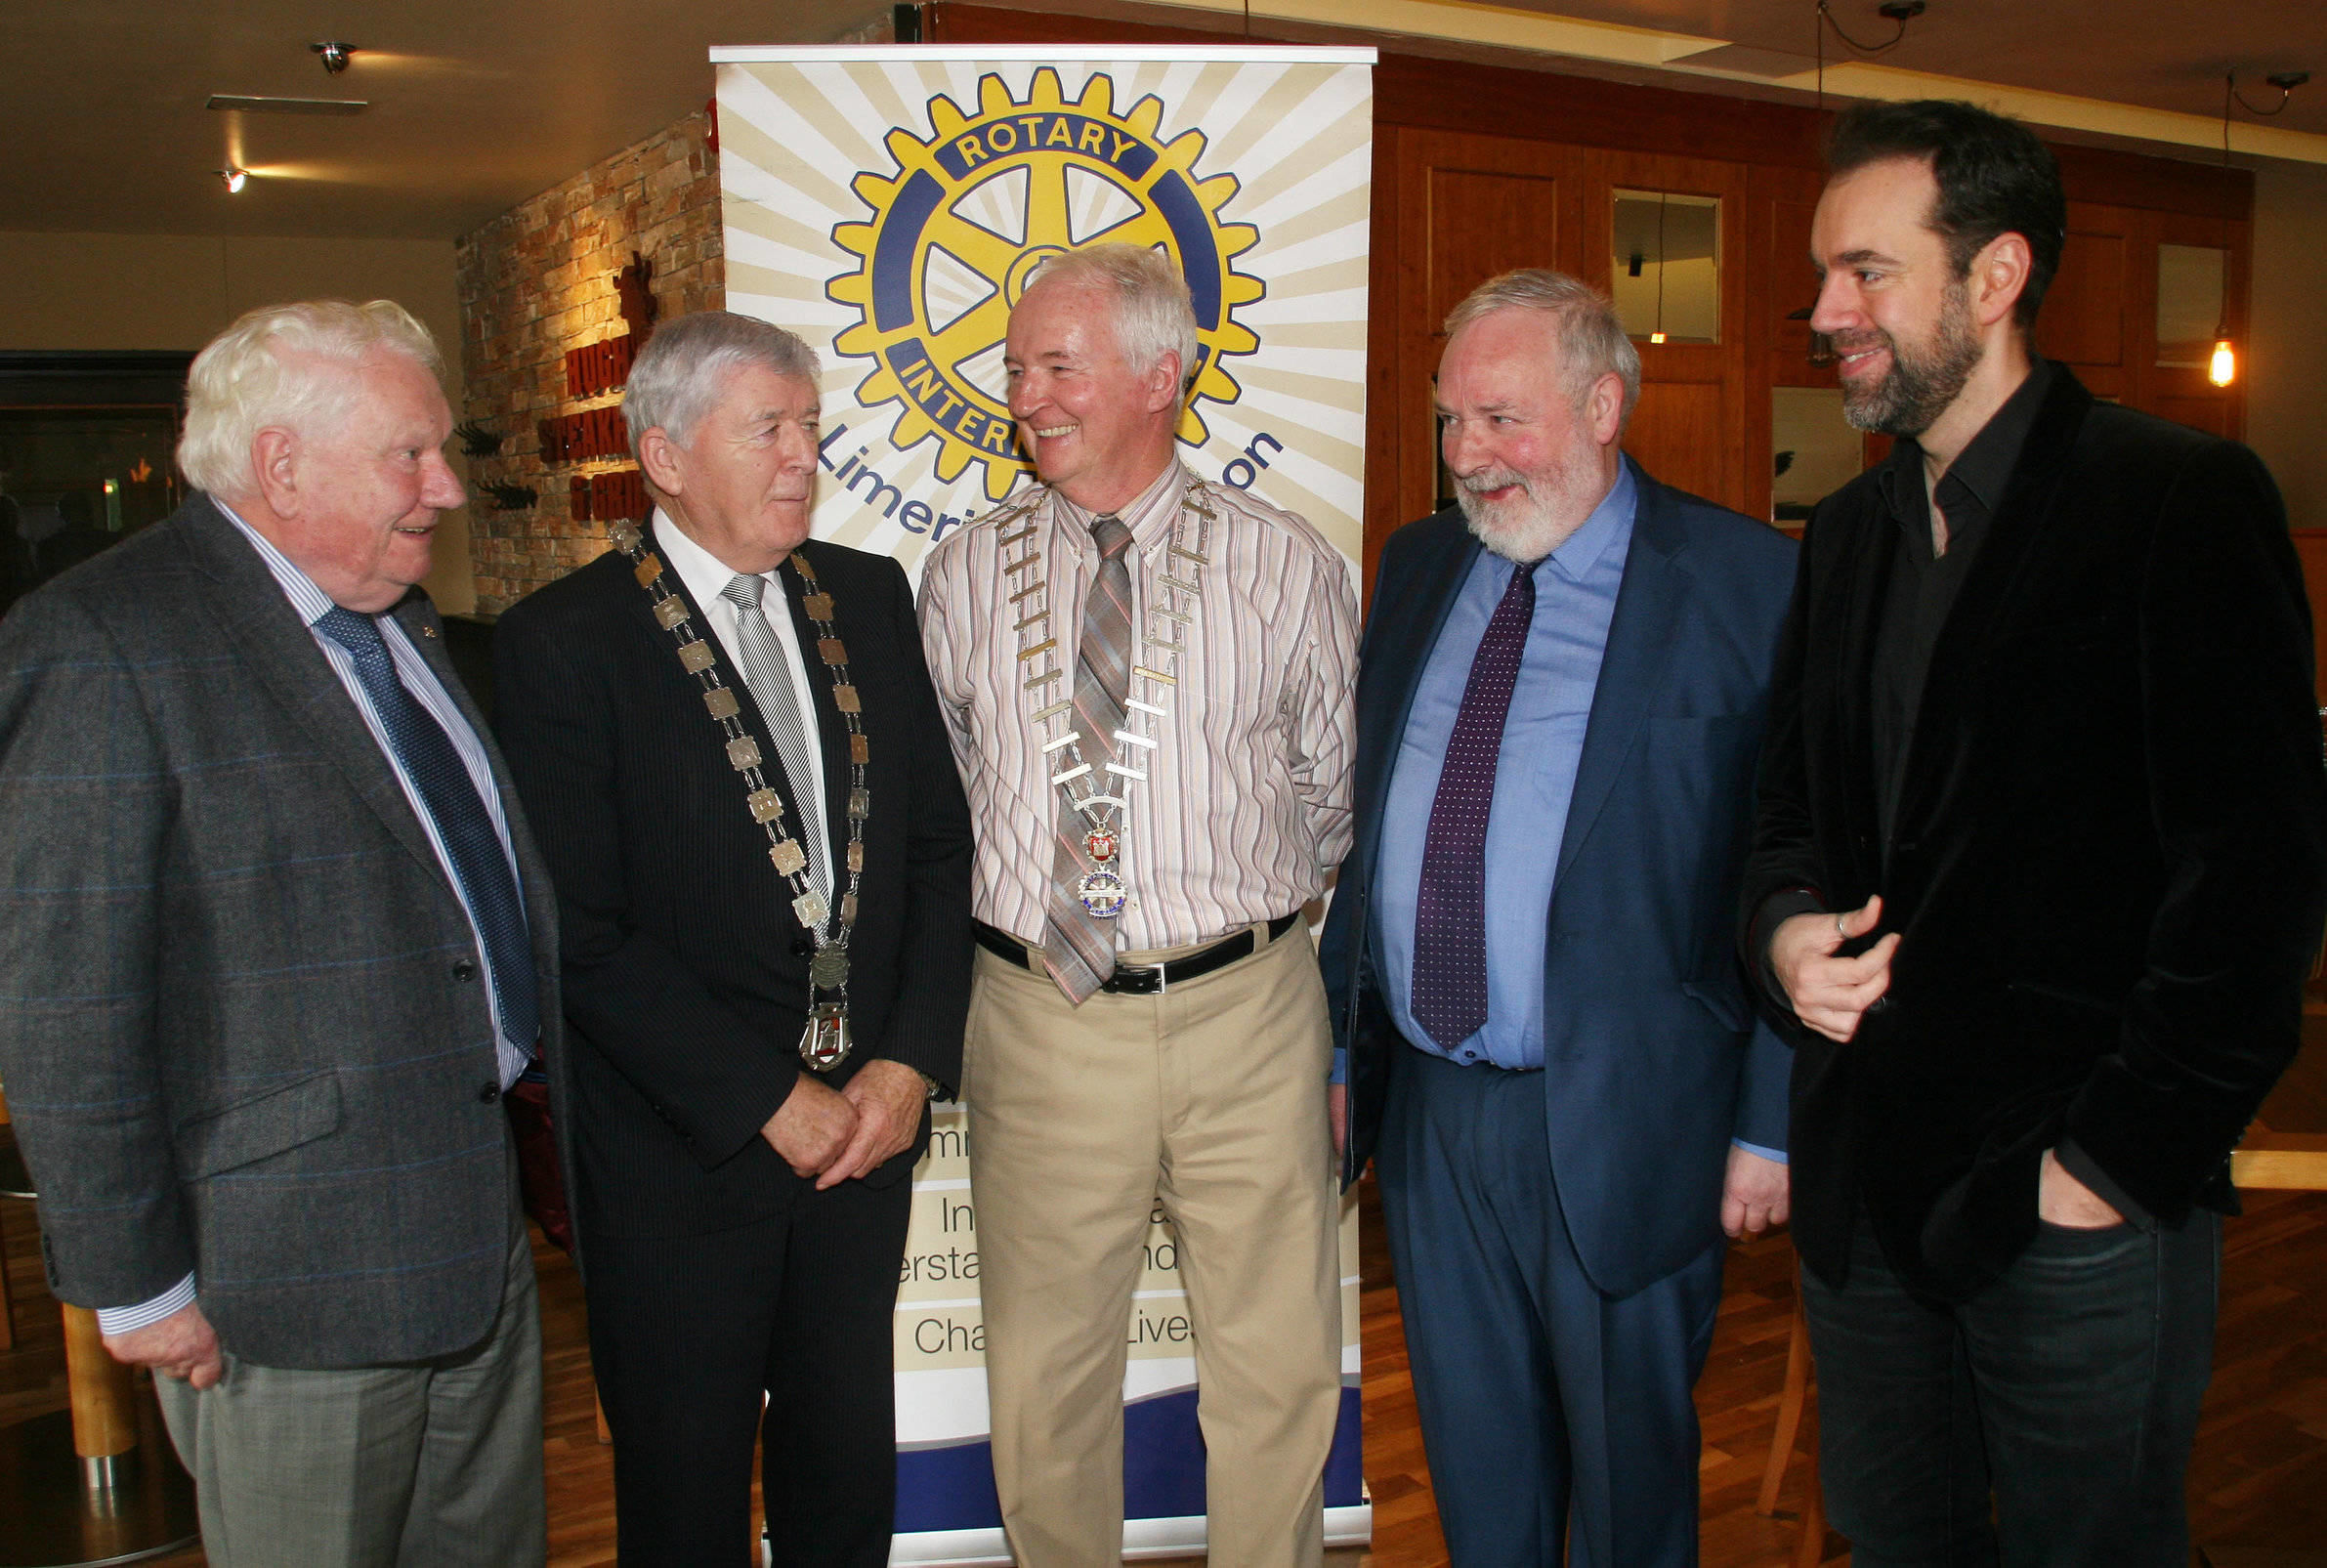 Limerick Shannon Rotary Club gala concert